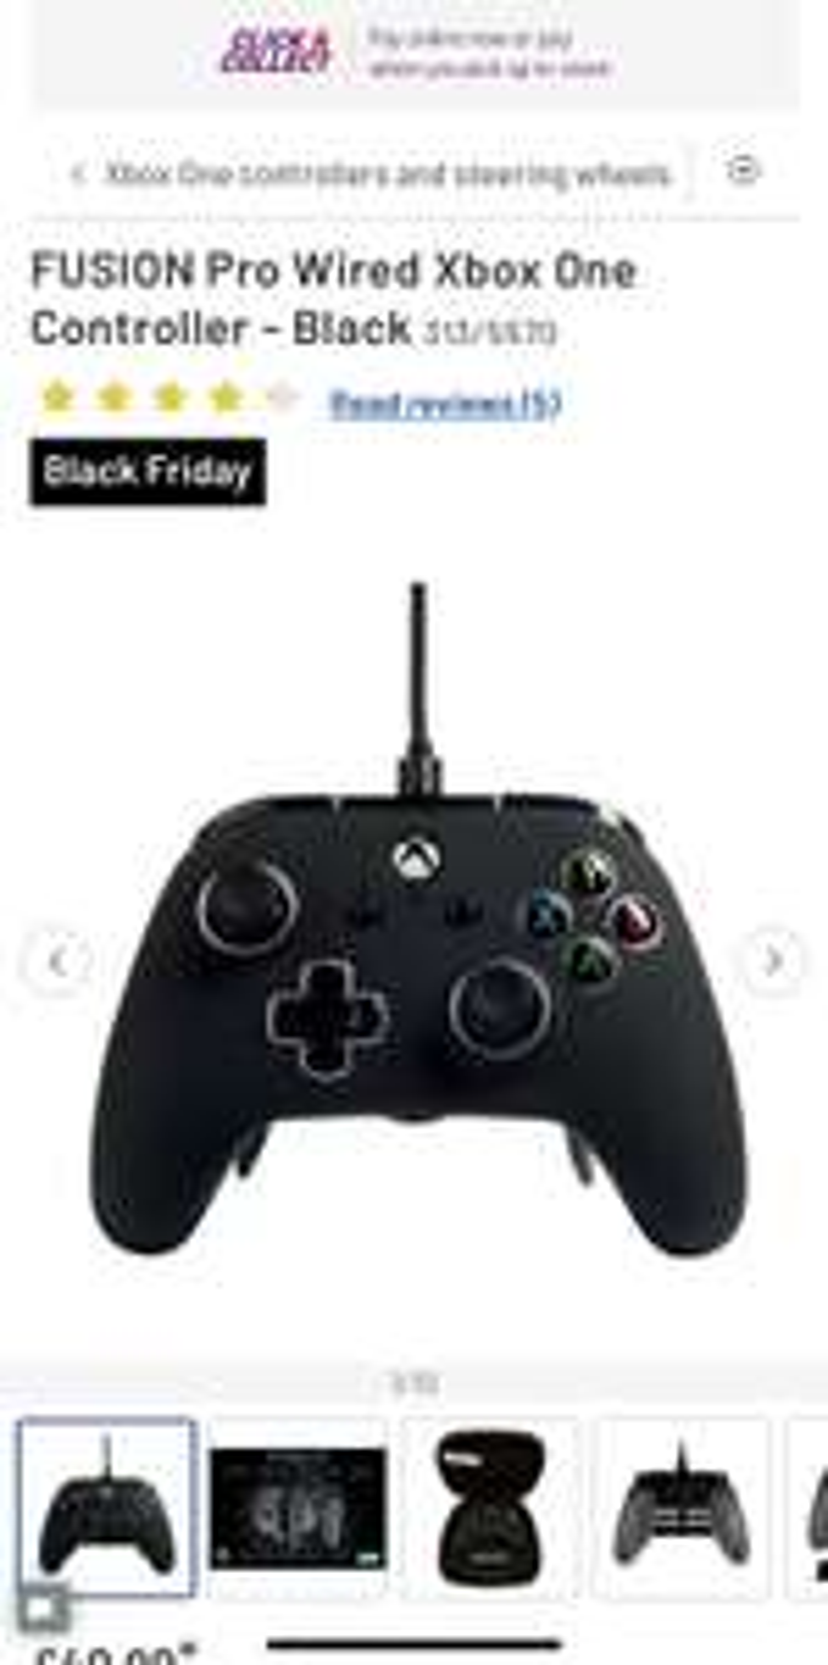 FUSION Pro Wired Xbox One Controller - Black - £49.99 @ Argos